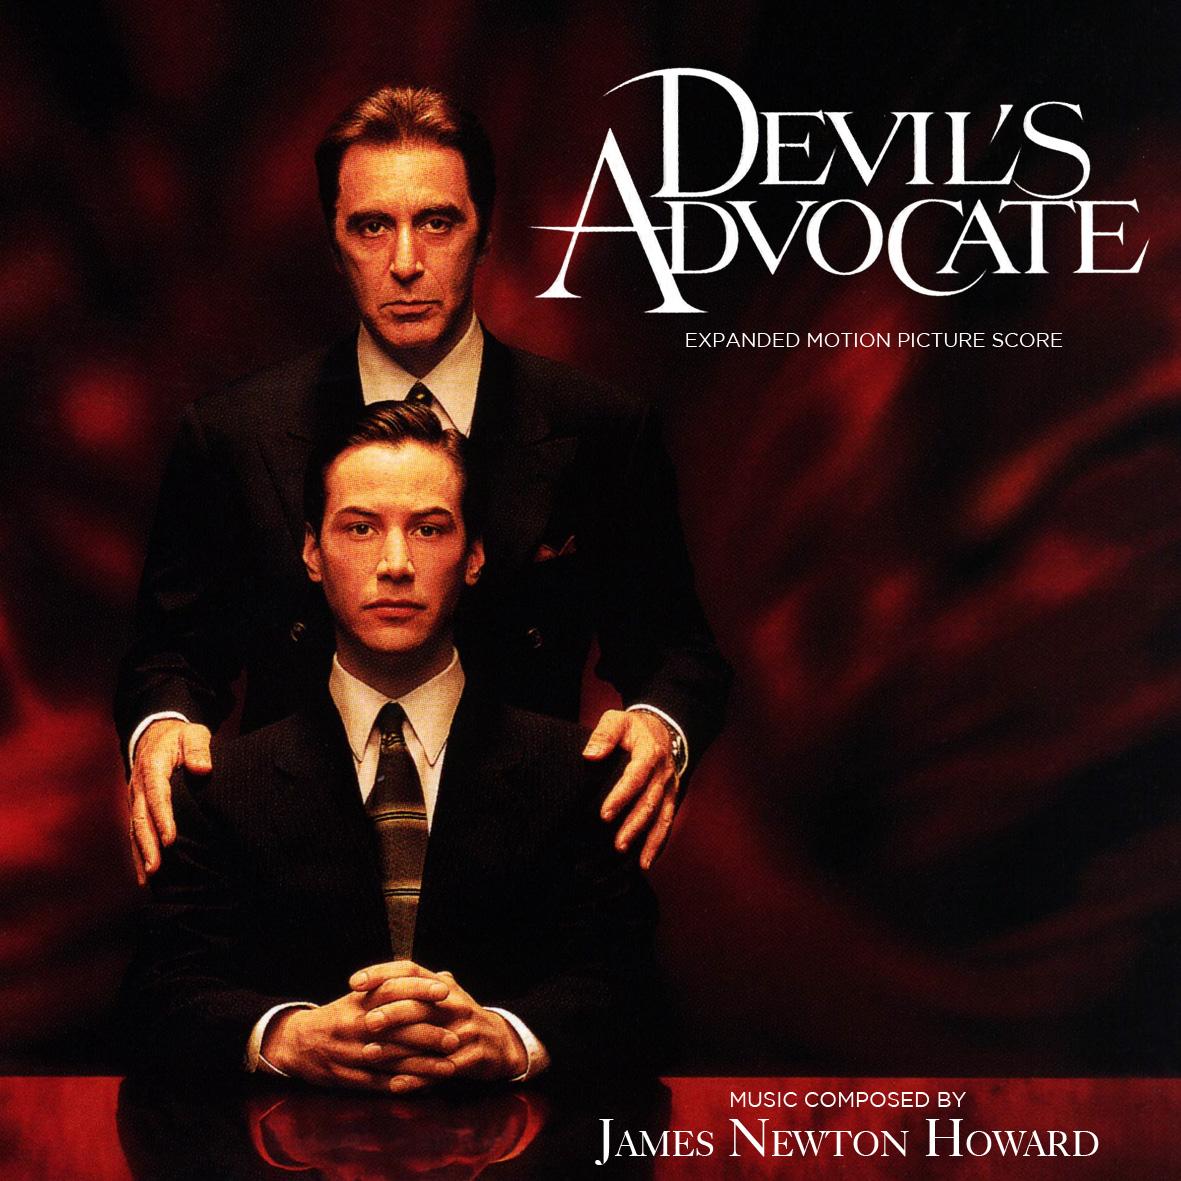 http://1.bp.blogspot.com/-HObr9xkFokU/TzMbzCIXRhI/AAAAAAAAAso/bWVn5_P1Wso/s1600/avocatul+diavolului%252C+pact+cu+diavolul+film+online+subtitrat%252C+the+devils+advocate+film+intreg%252C+keanu+reeves%252C+al+pacino%252C+charlize+theron.jpg